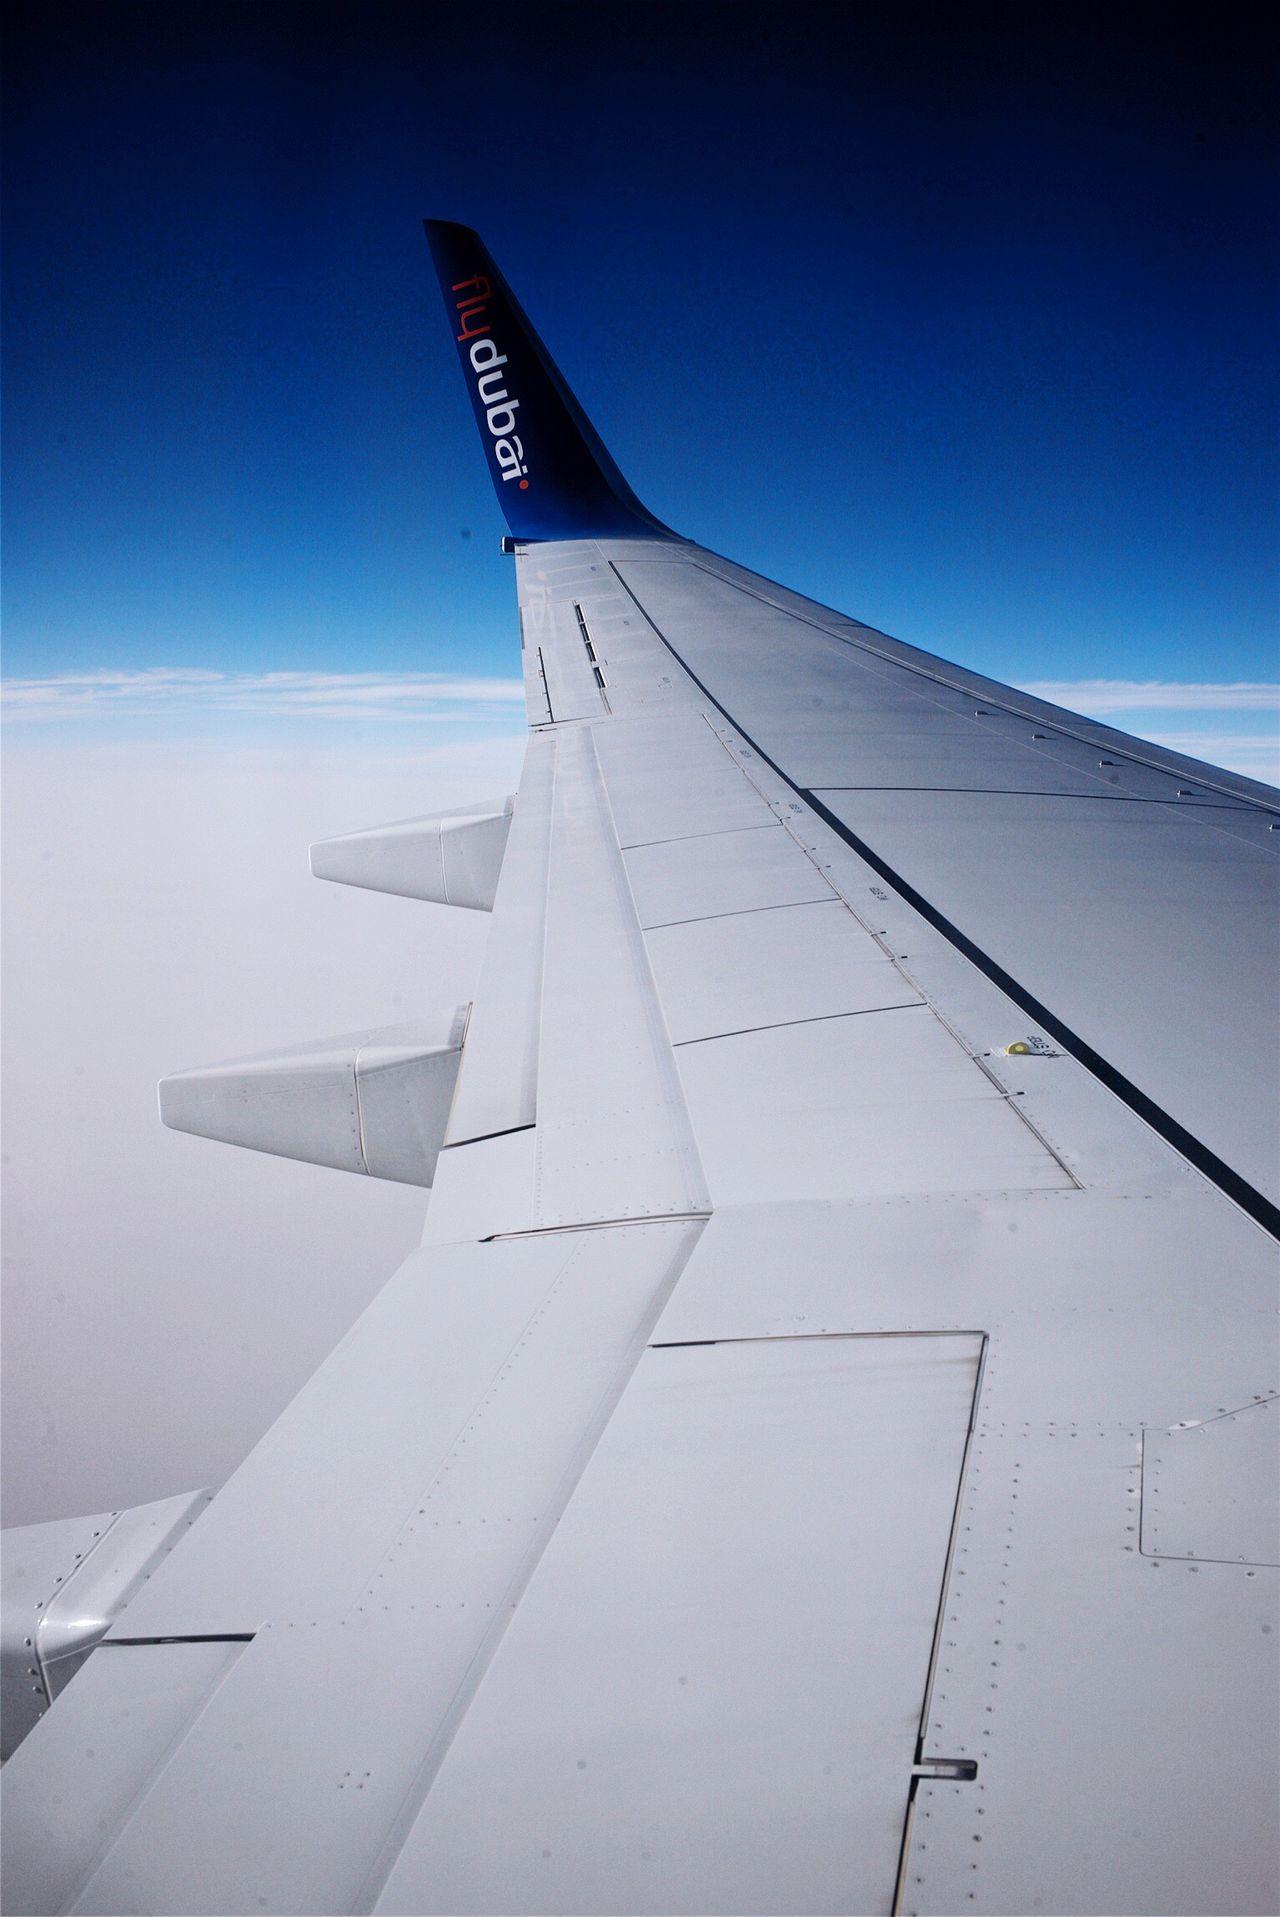 Flydubai Airplane Wing